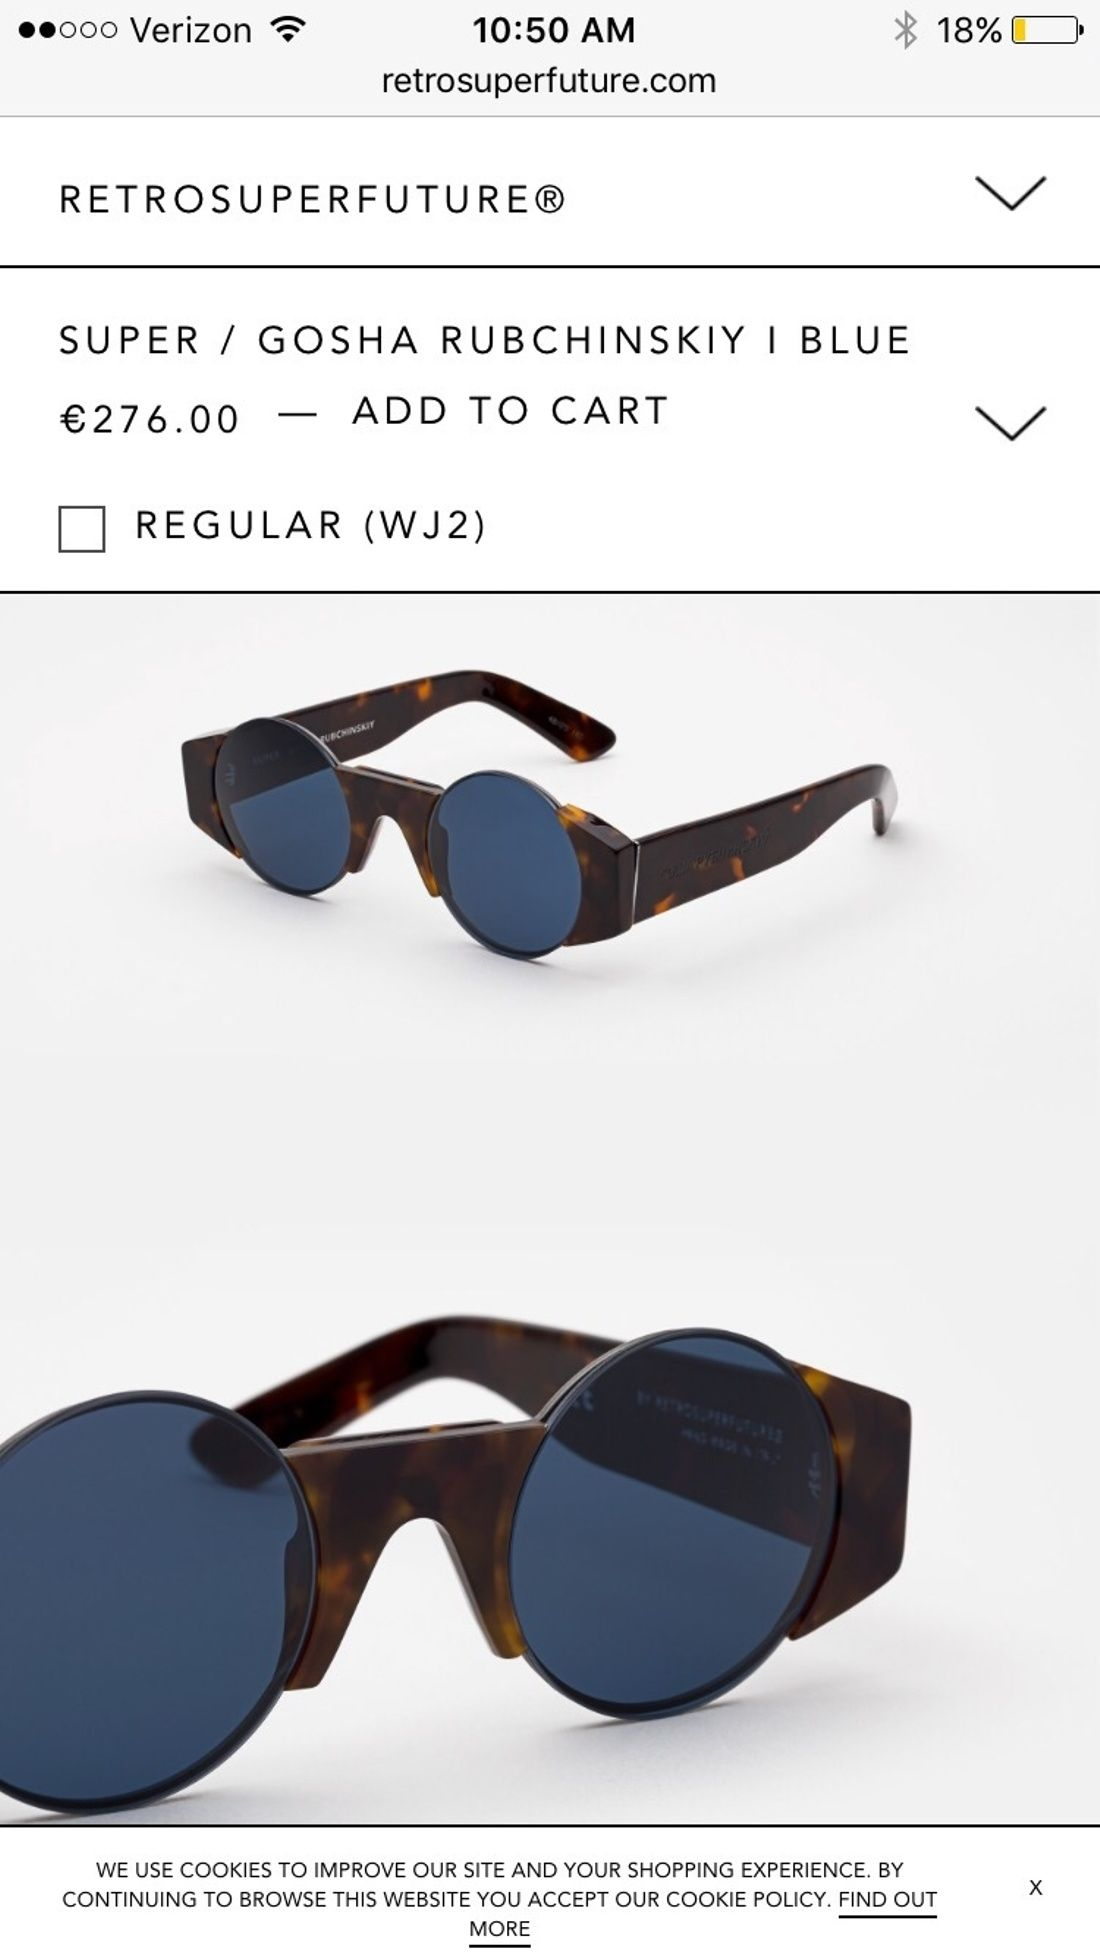 ffb5cc625f87 Gosha Rubchinskiy Gosha Rubchinskiy Super Sunglasses Size One Size  550 -  Grailed